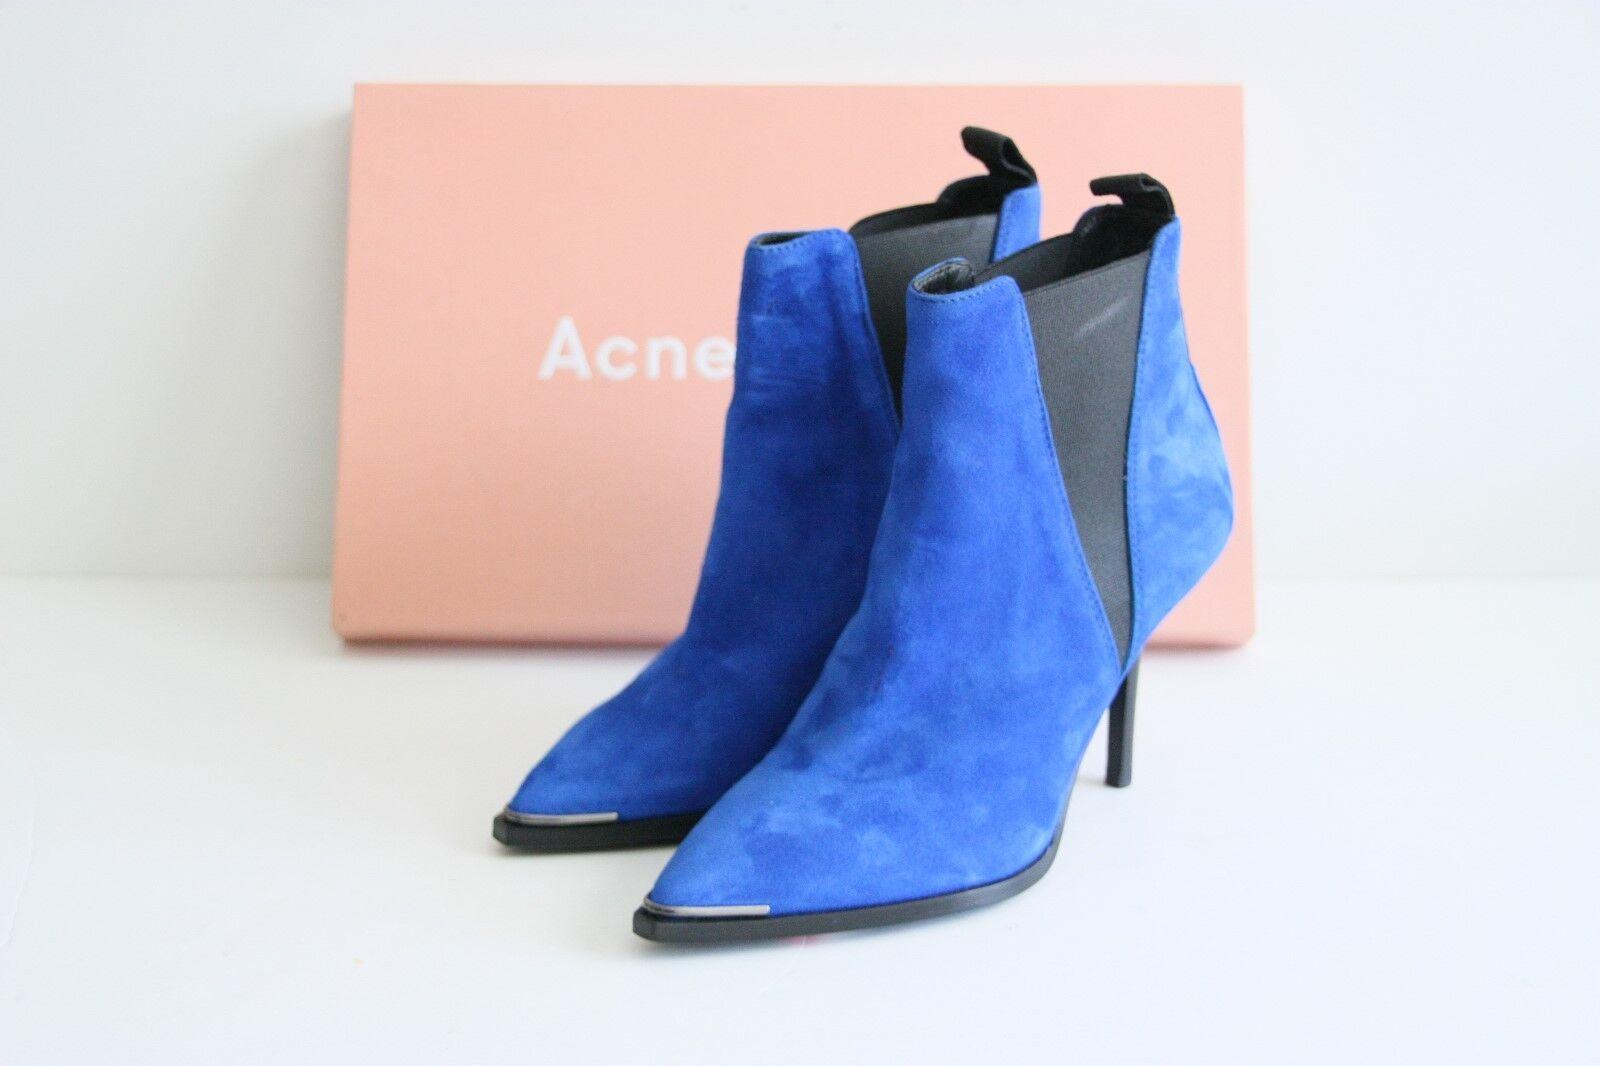 600 Brand New ACNE STUDIOS JENS Indigo Suede Ankle Booties 35 / 5